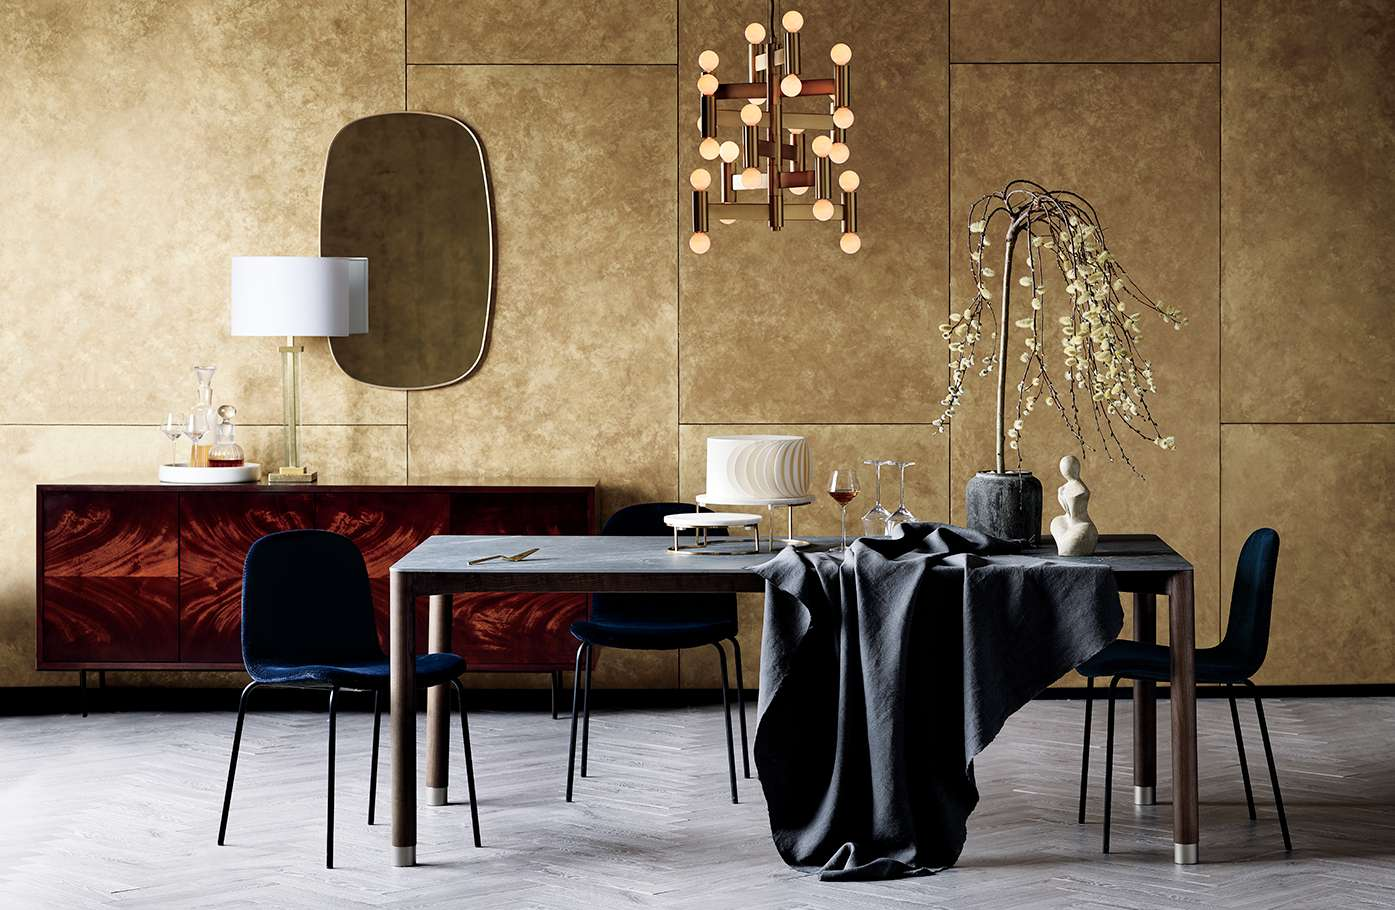 A Designer's Tips for Revamping Your Dining Room For Less Than $600 | Hunker